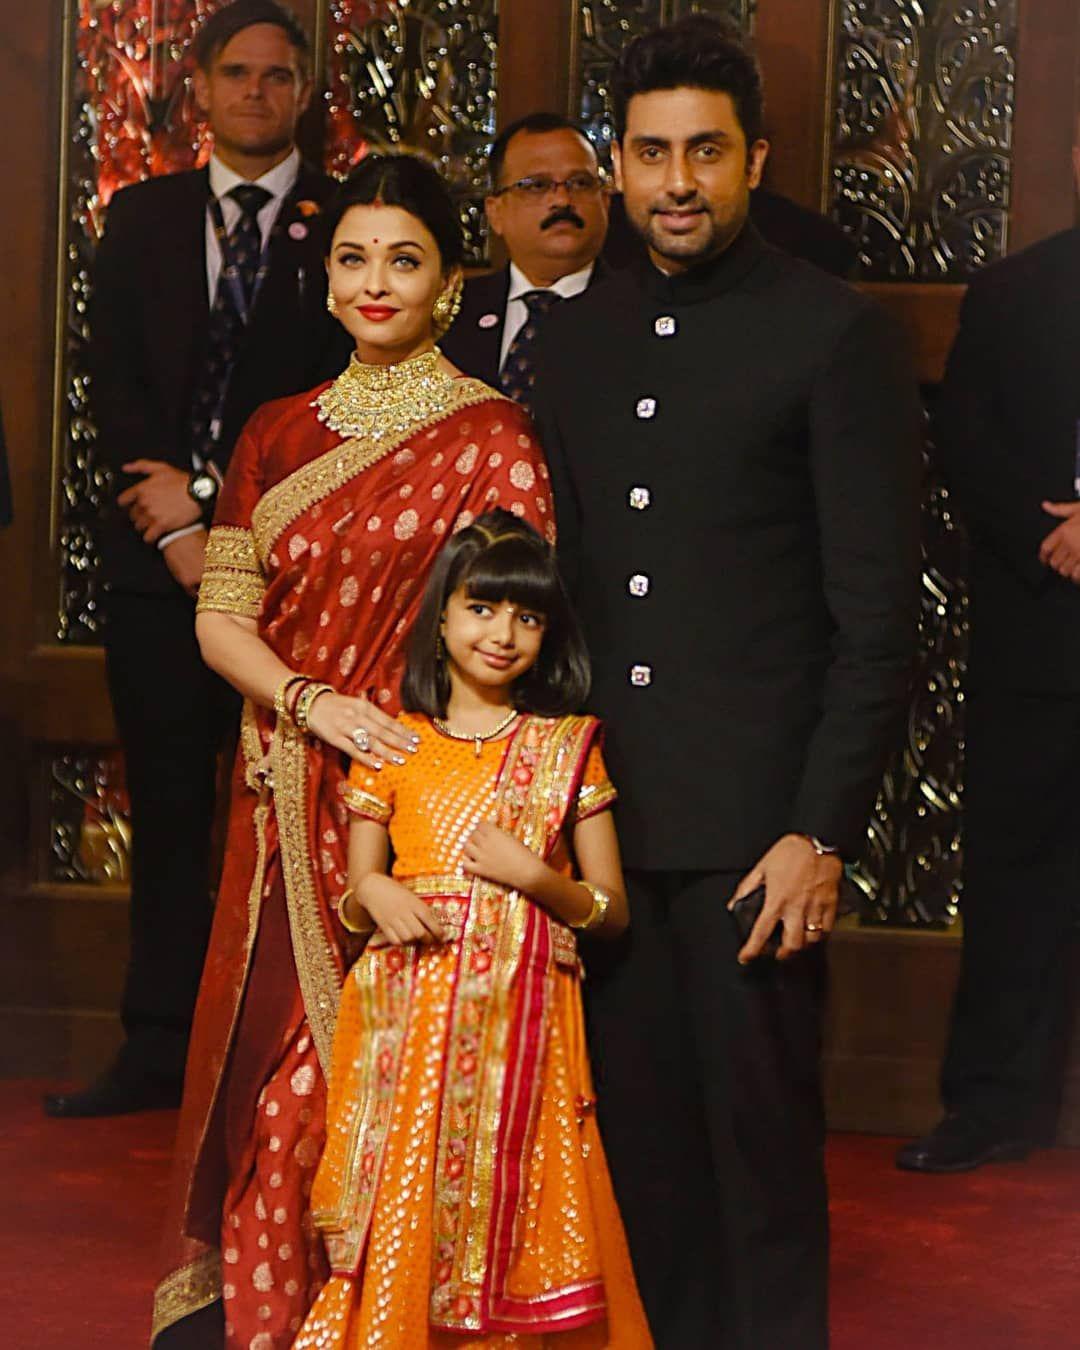 "Aishwarya Rai on Instagram ""ROYAL FAMILY 👨👩👧 TBT Isha"